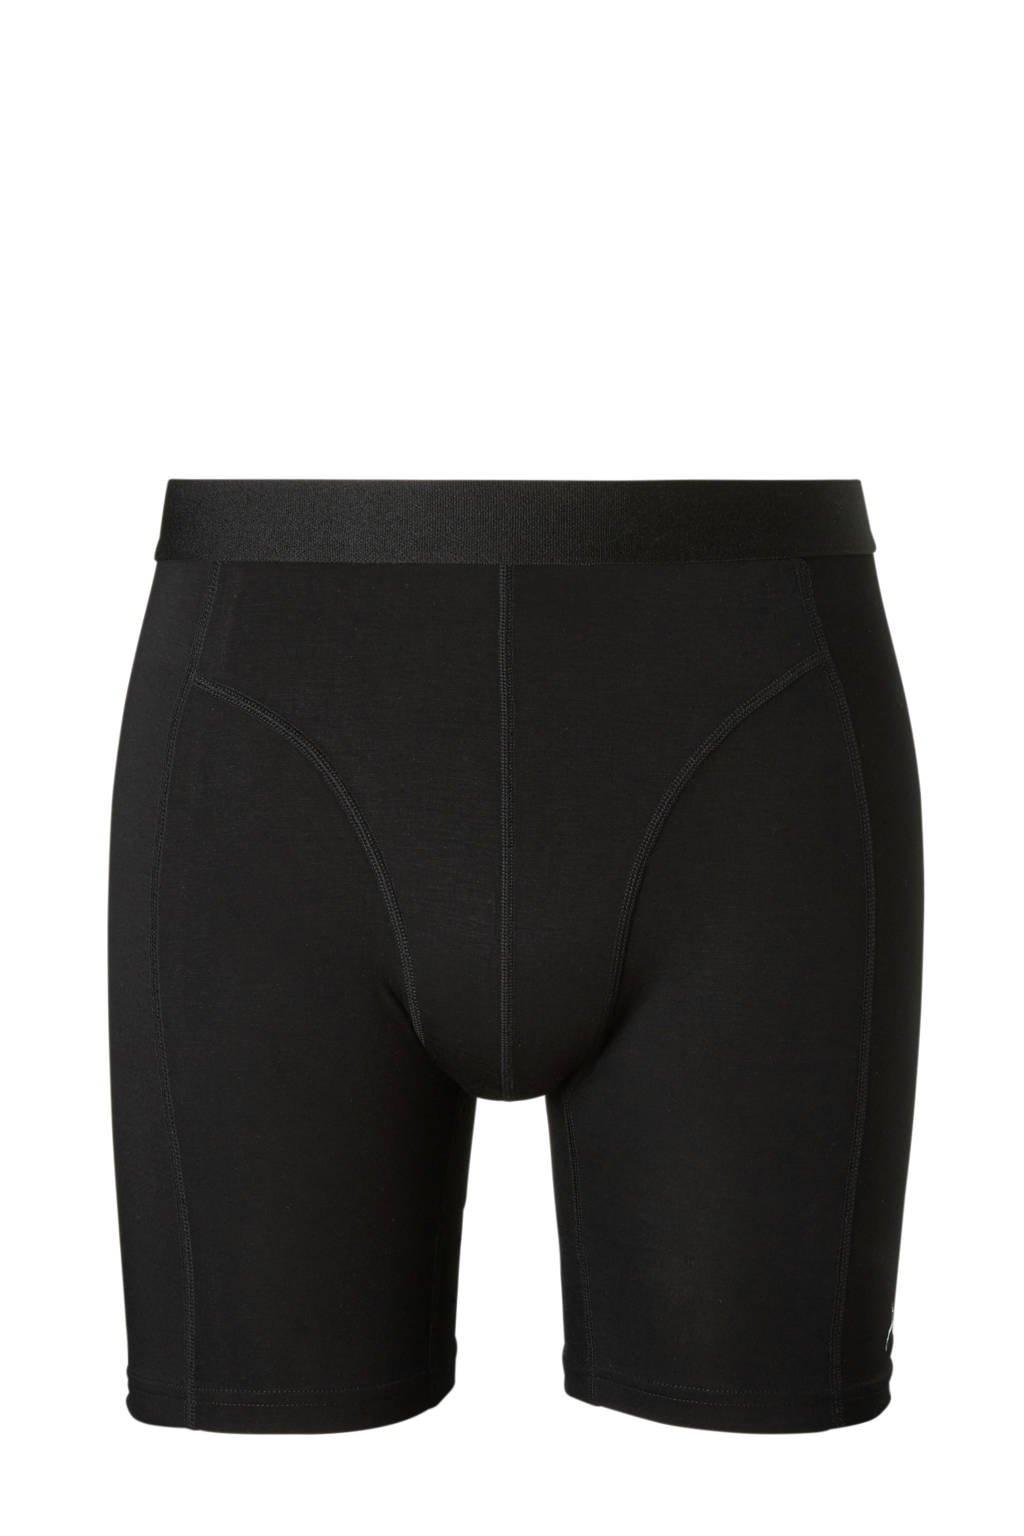 Bamboe boxershorts van Ten Cate